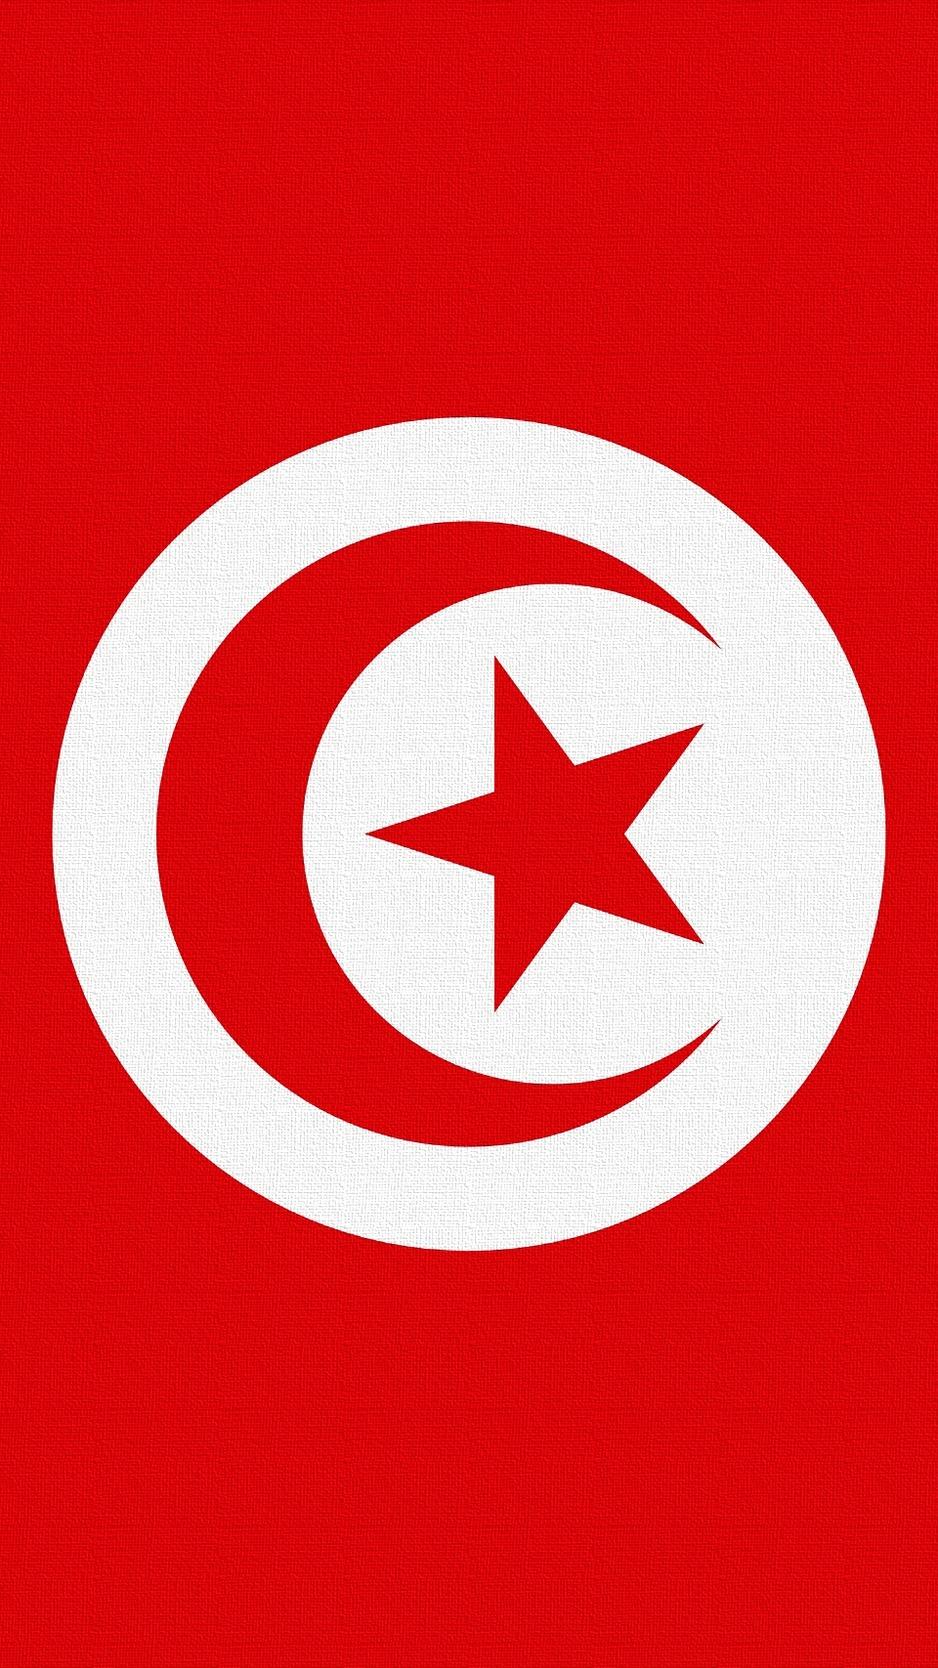 Download wallpaper 938x1668 tunisia flag star symbols iphone 8 938x1668